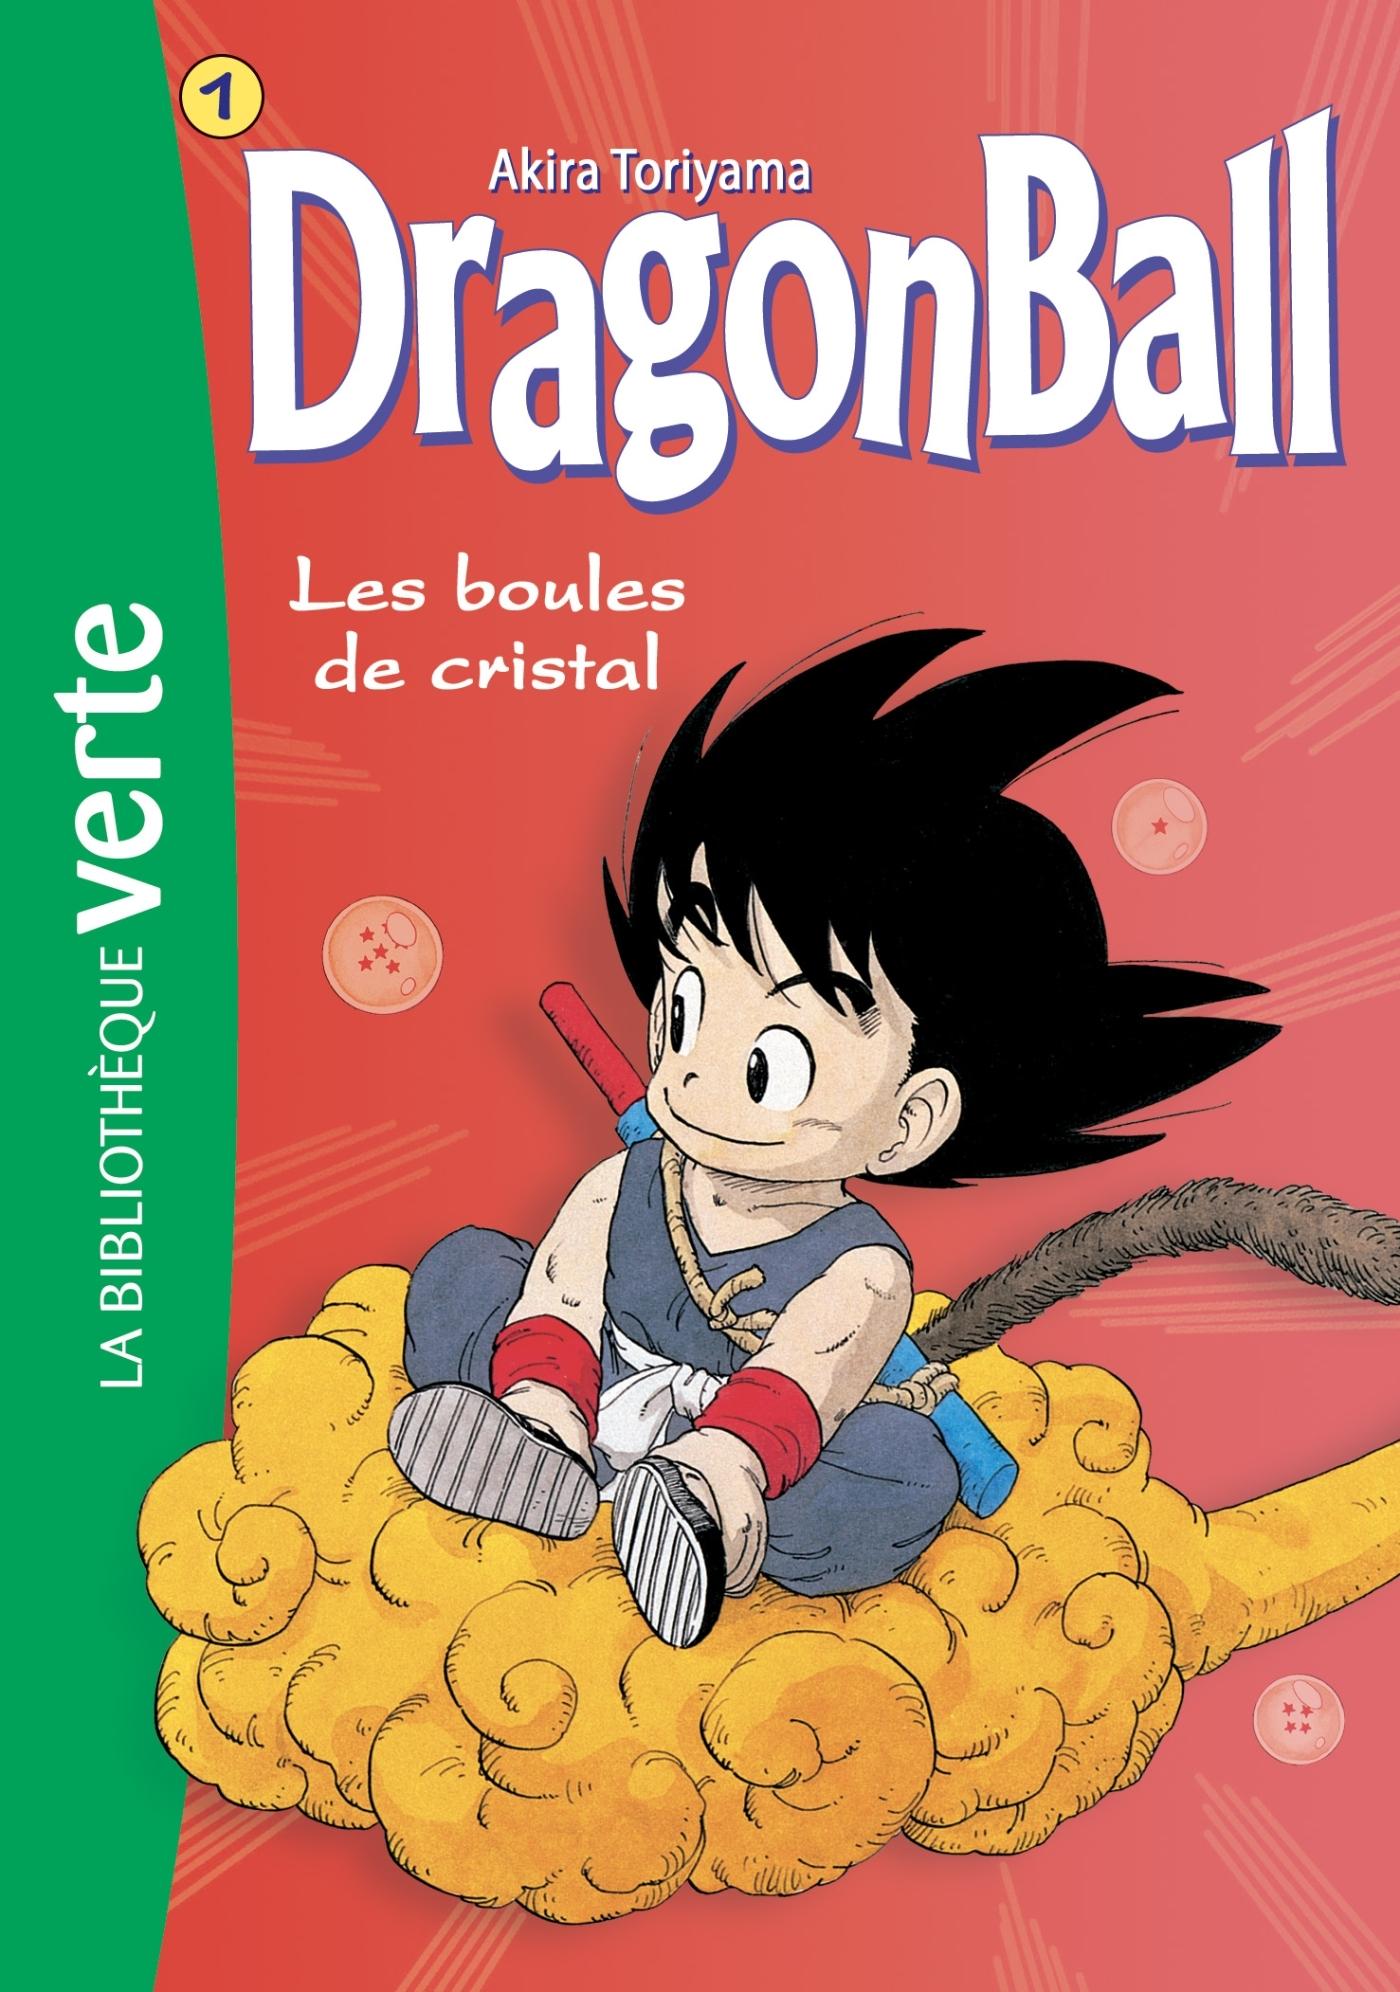 DRAGON BALL 01 NED 2018 - LES BOULES DE CRISTAL